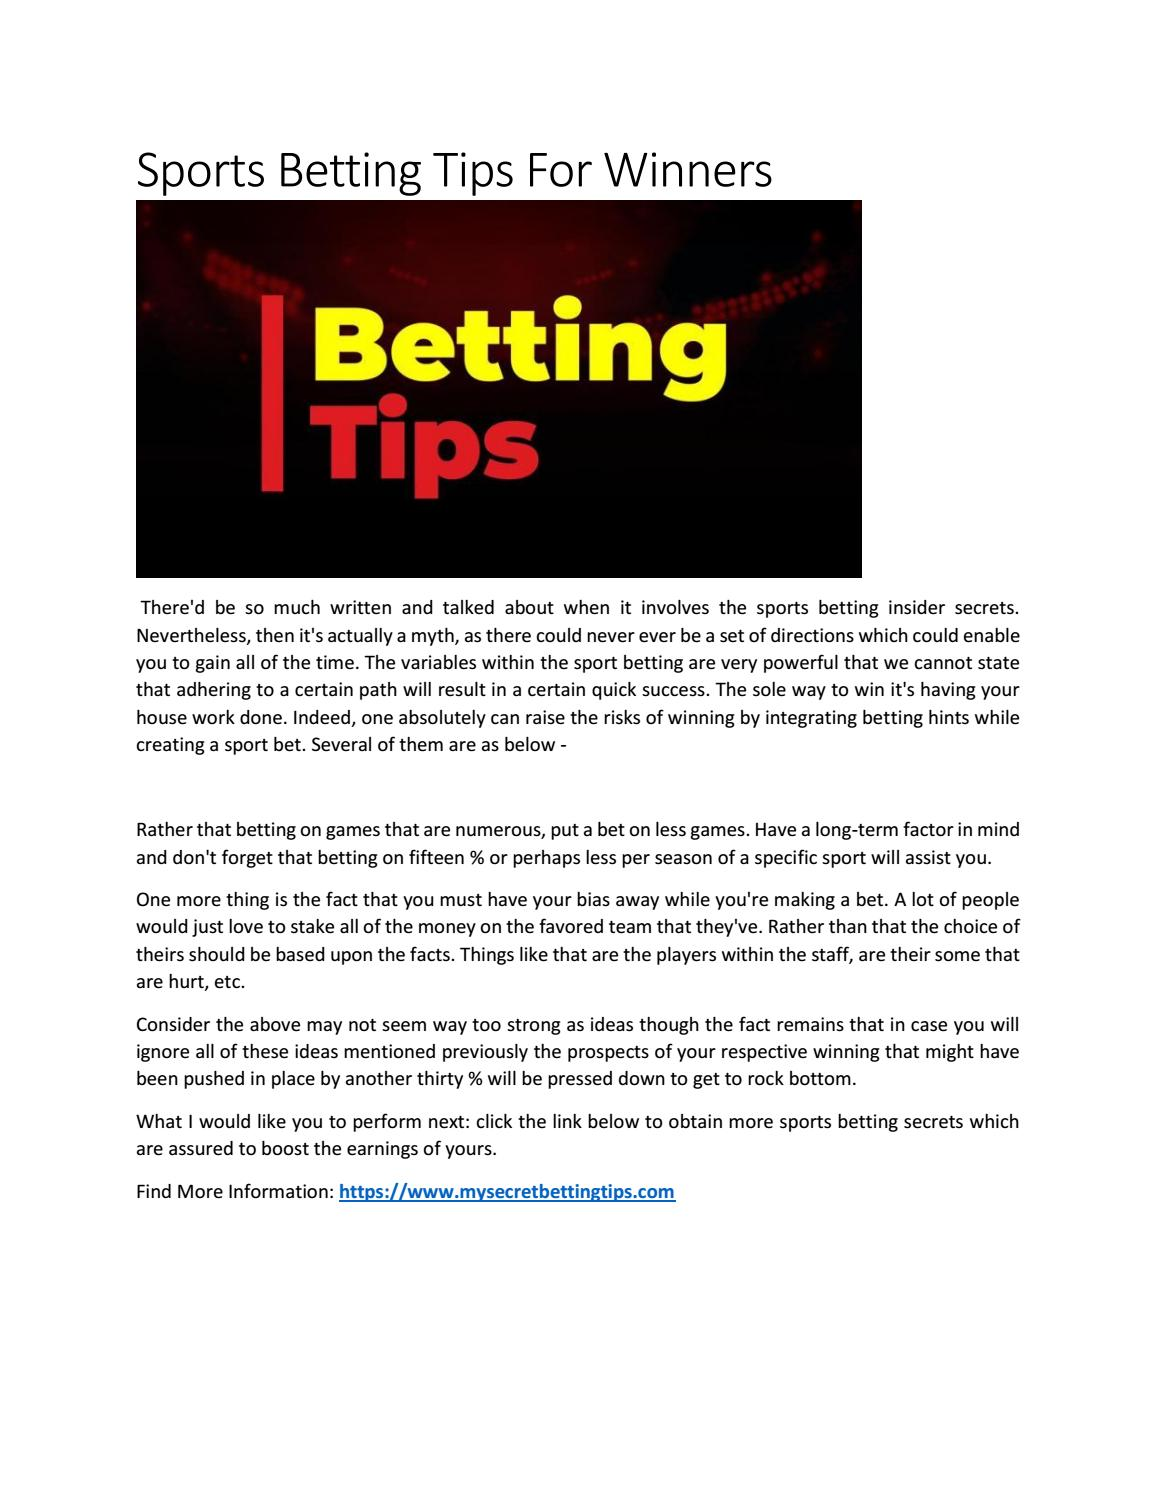 sports betting secrets